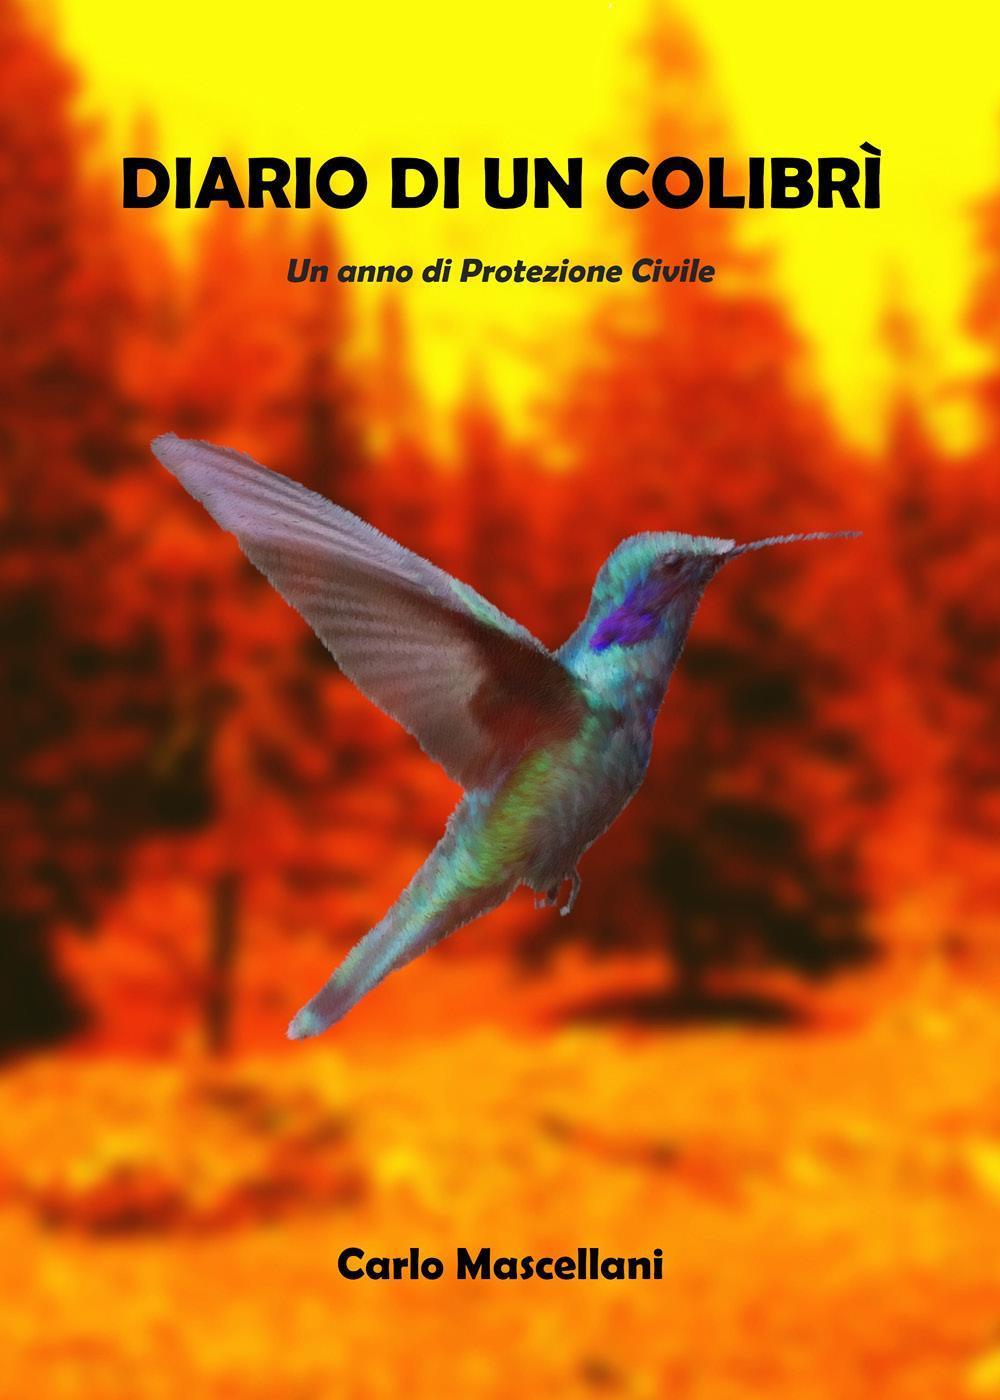 Diario di un colibrì